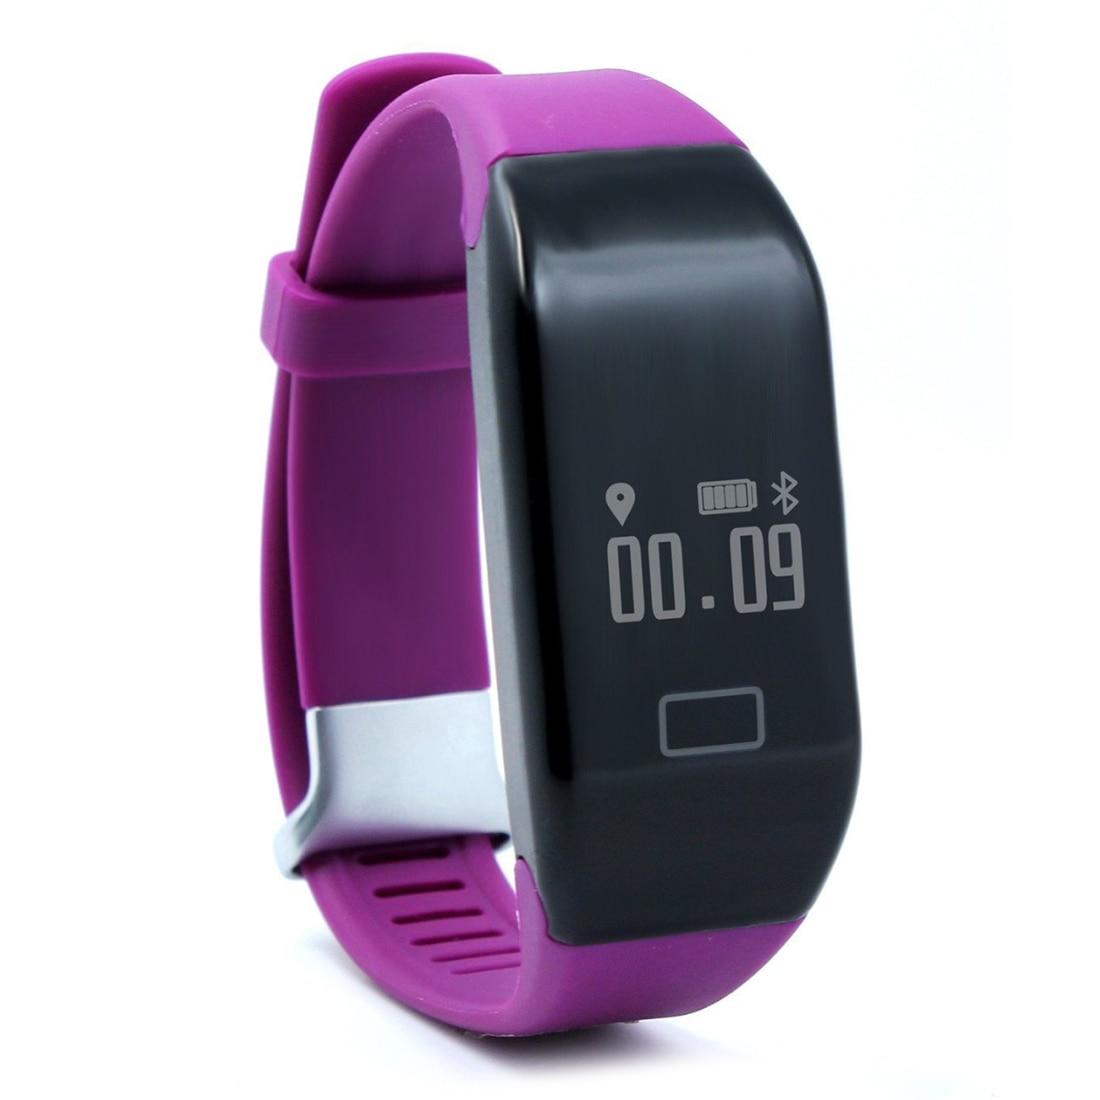 H3 Bluetooth 4.0 IP67 waterproof OLED Display smart watch wristband Heart rate pedometer(purple)